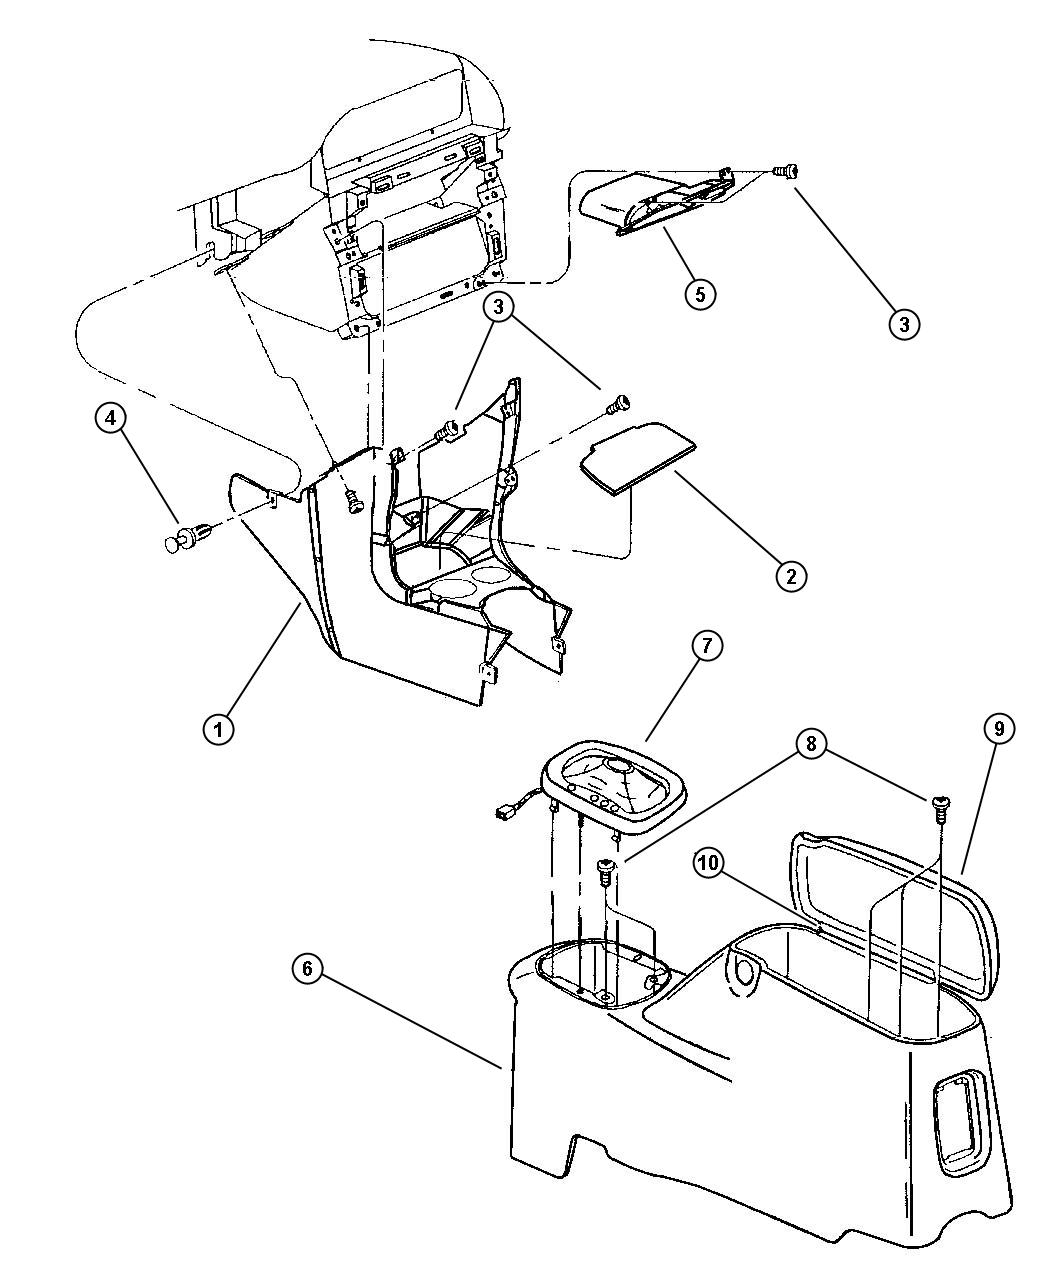 transmission wiring diagram moreover buick lacrosse wiring diagram